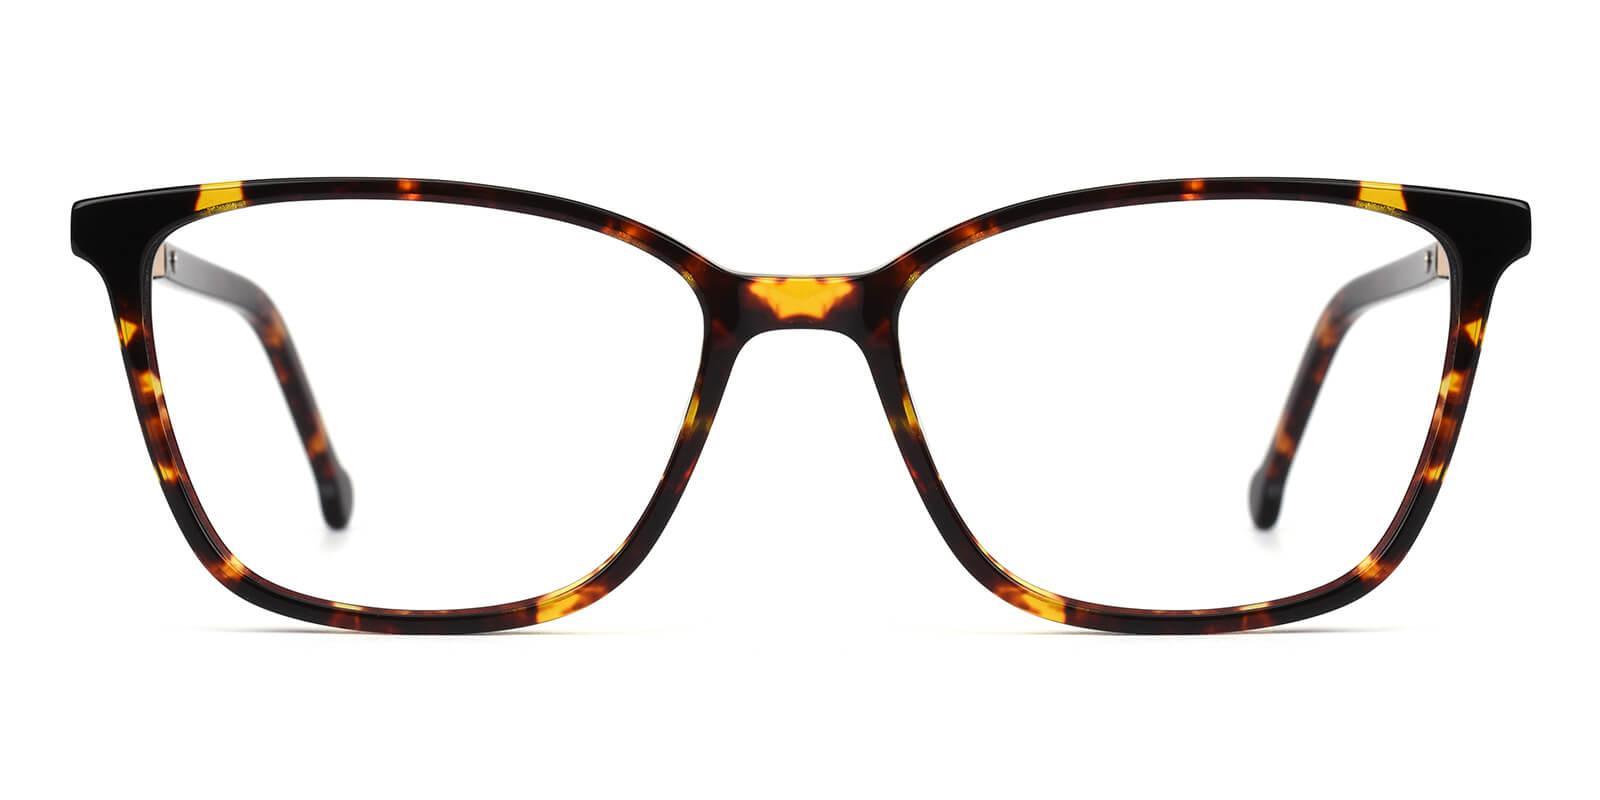 Ethan-Tortoise-Square-Acetate-Eyeglasses-detail